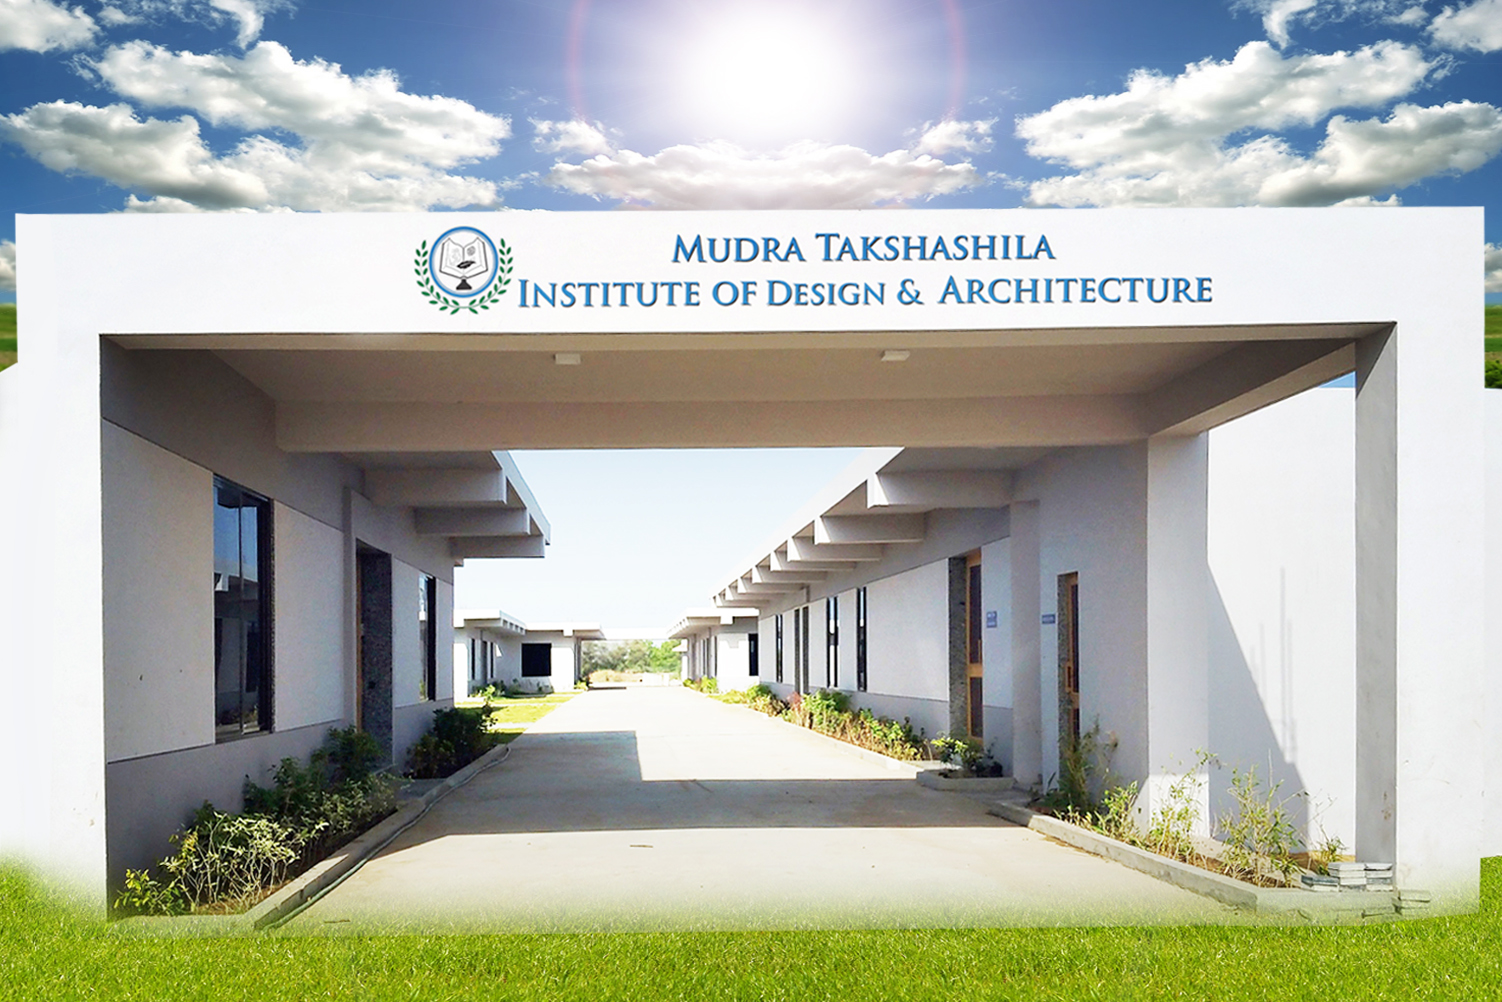 Mudra Takshashila Institute of Design and Architecture, Vadodara